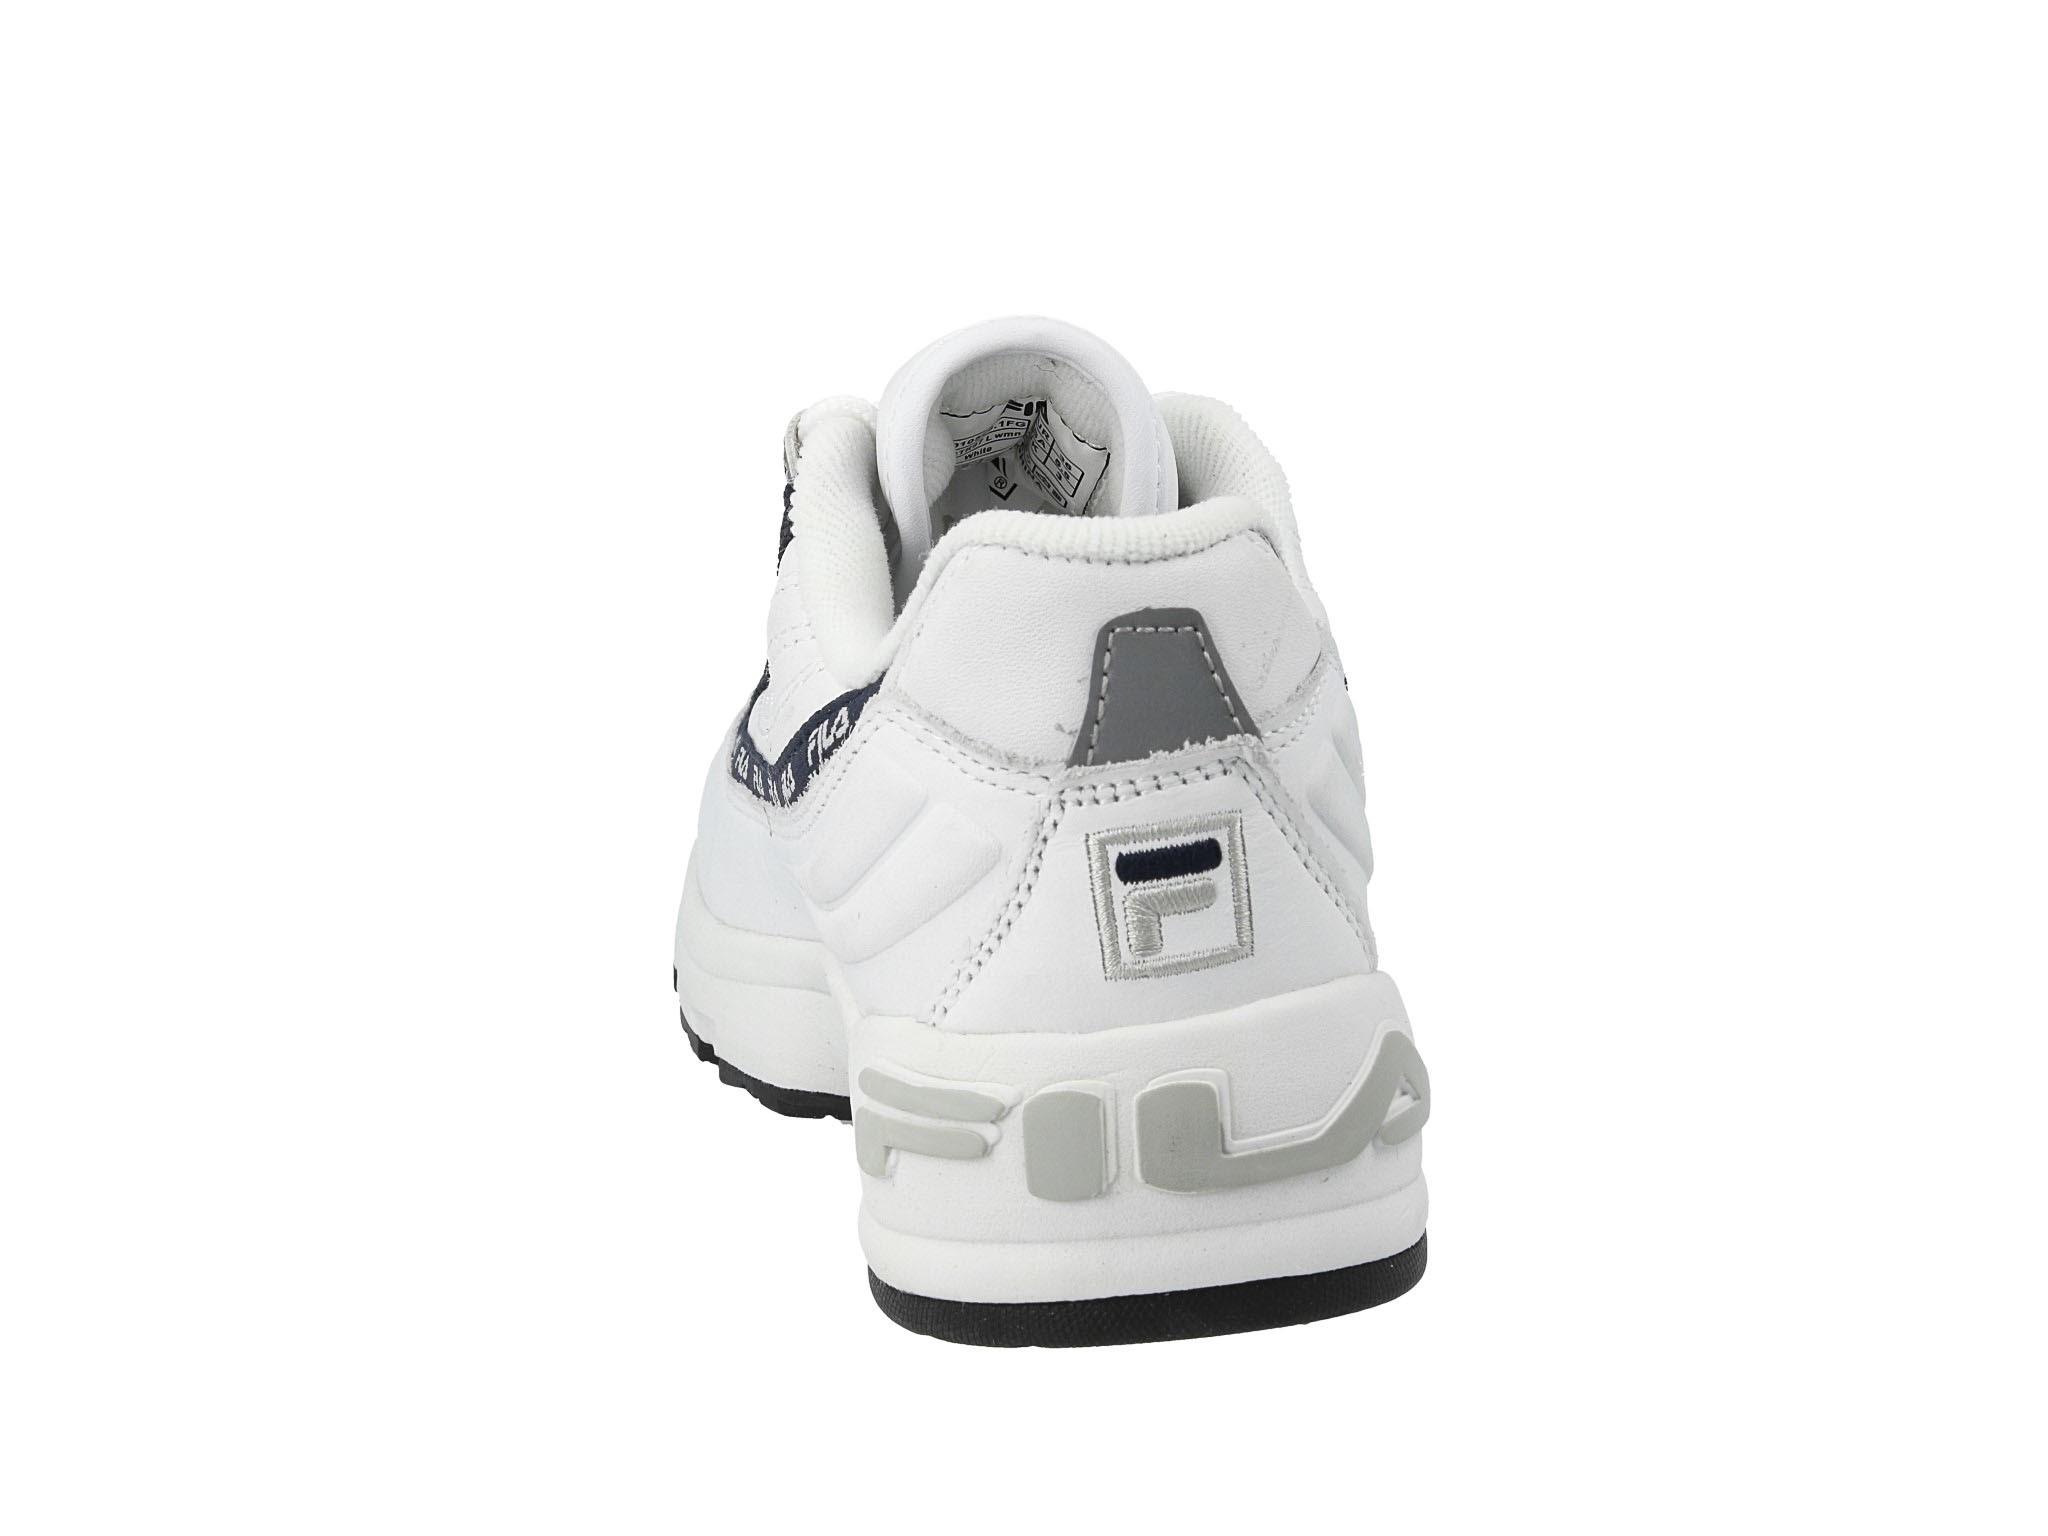 Sneakersy FILA Dstr97 L Wmn 1010596.1FG White Buty sportowe damskie białe w eobuwie.pl